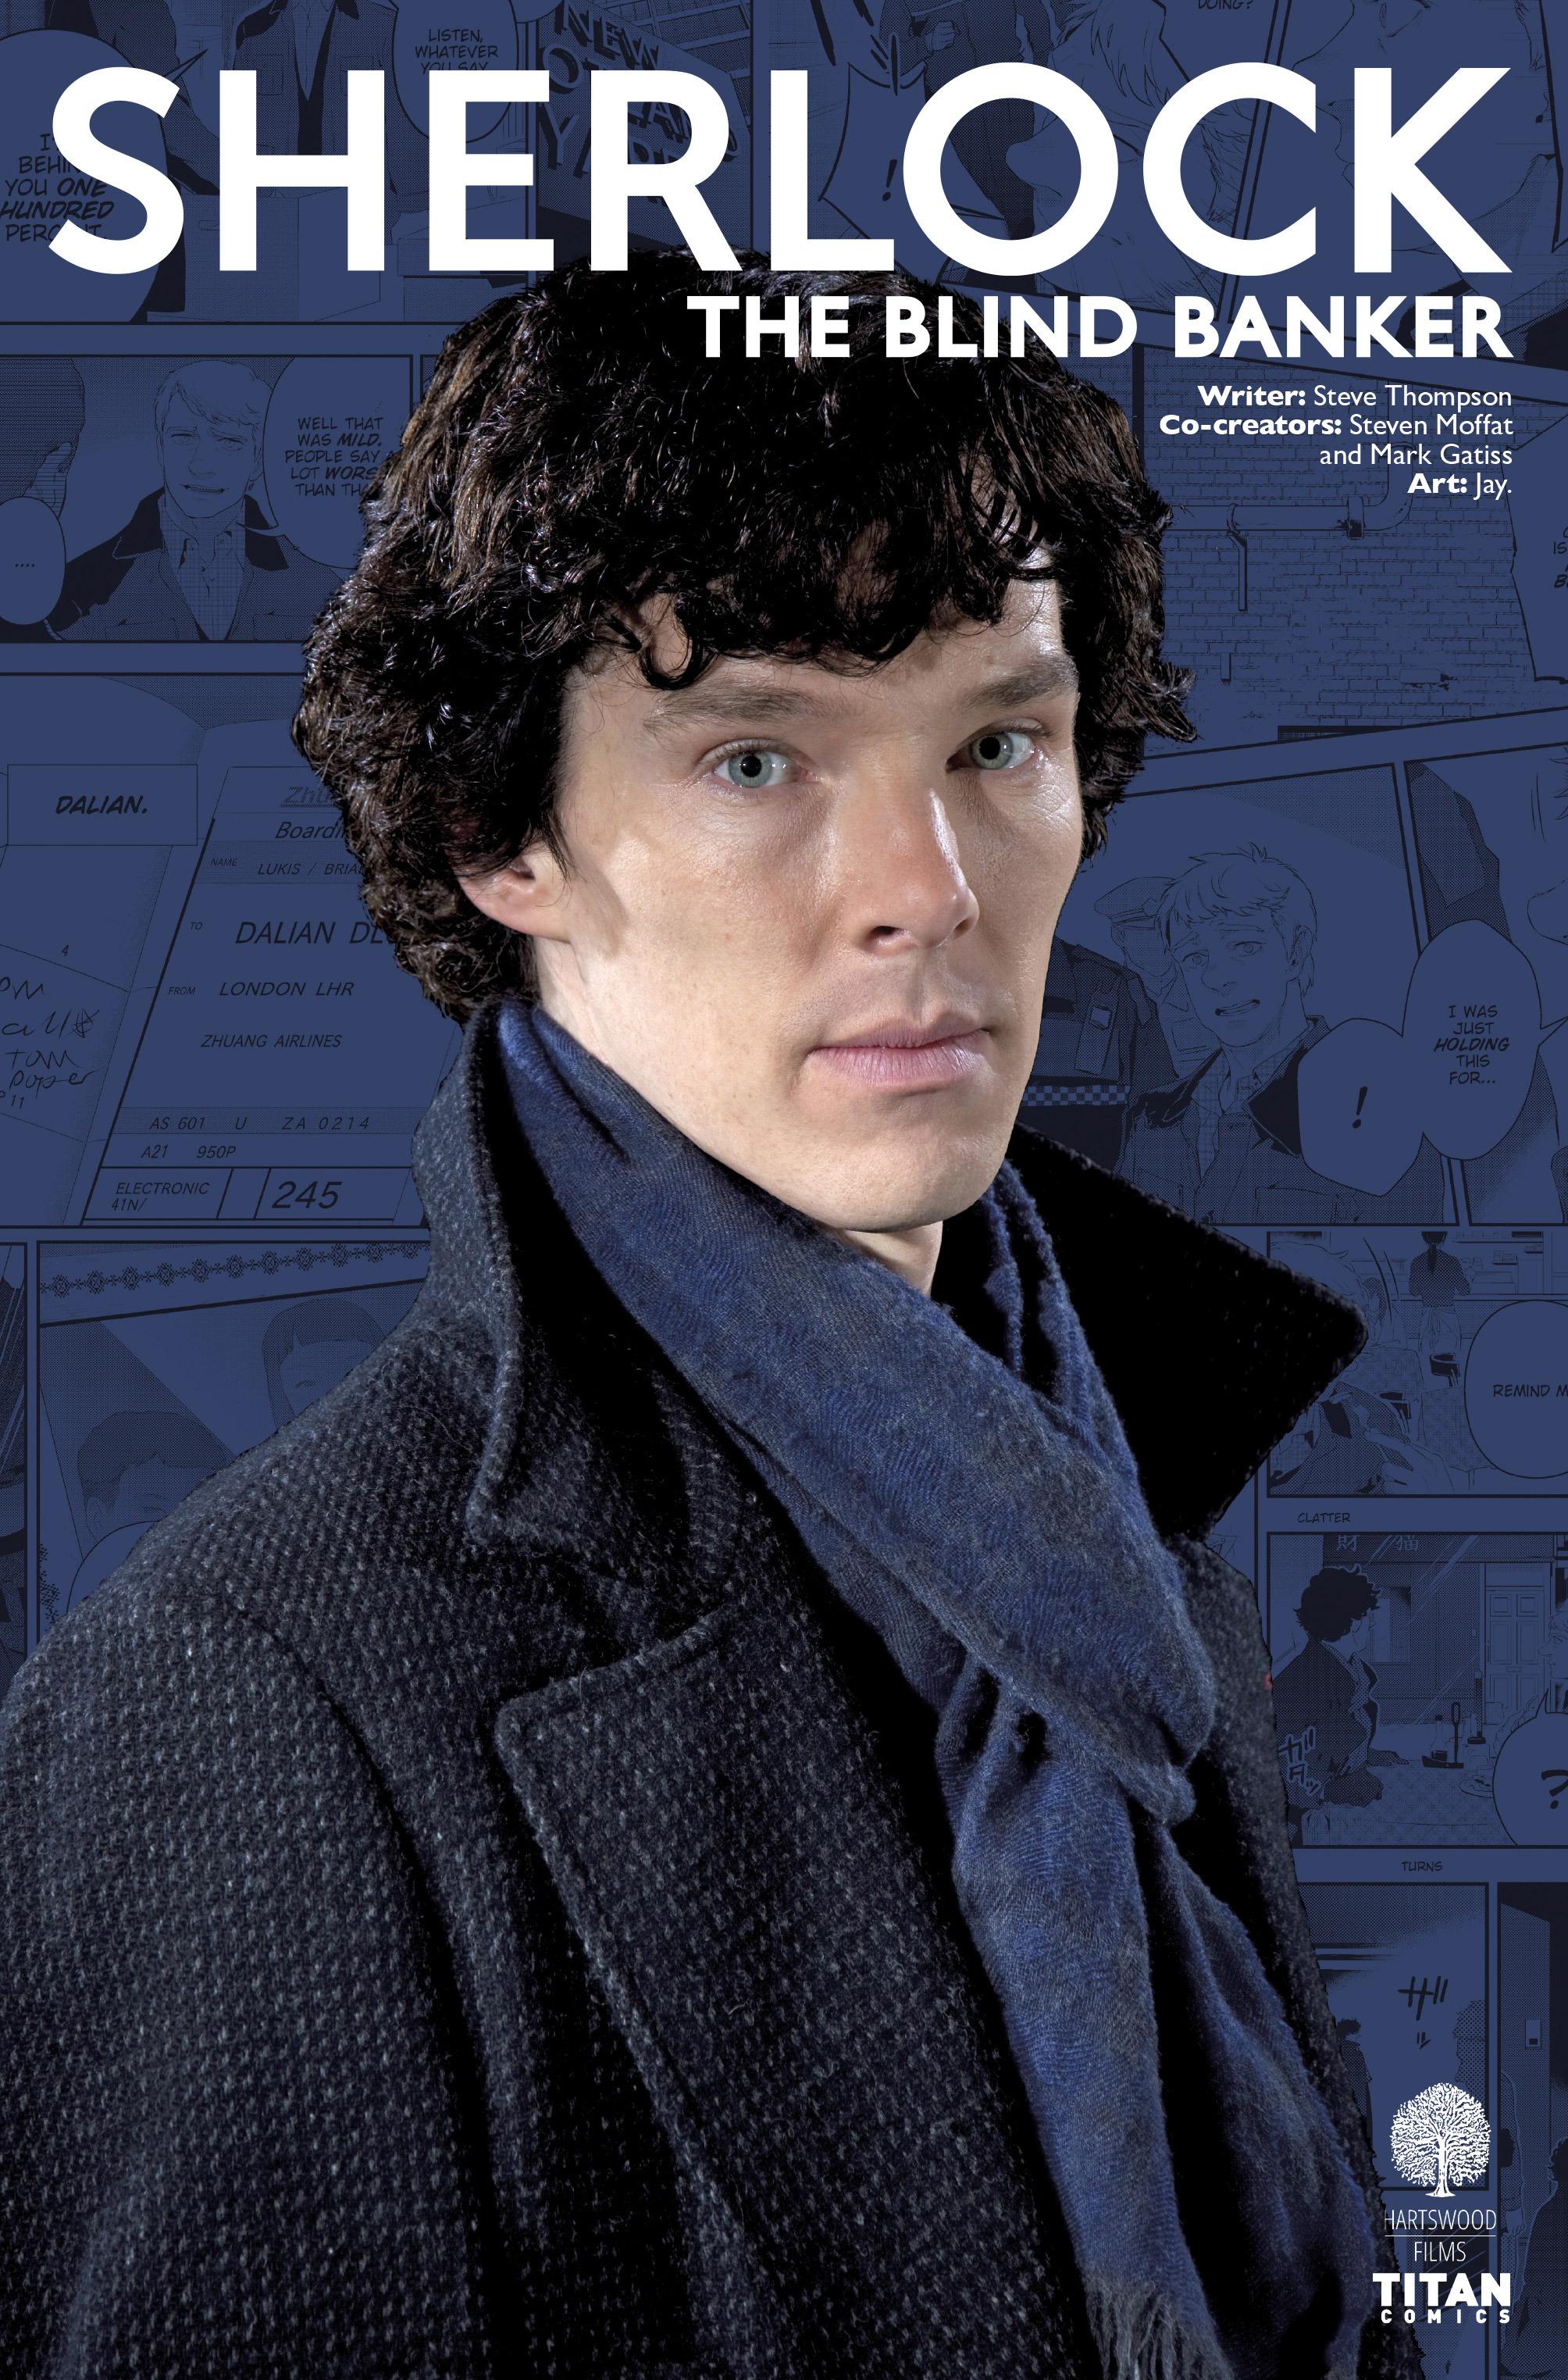 Read online Sherlock: The Blind Banker comic -  Issue #5 - 2